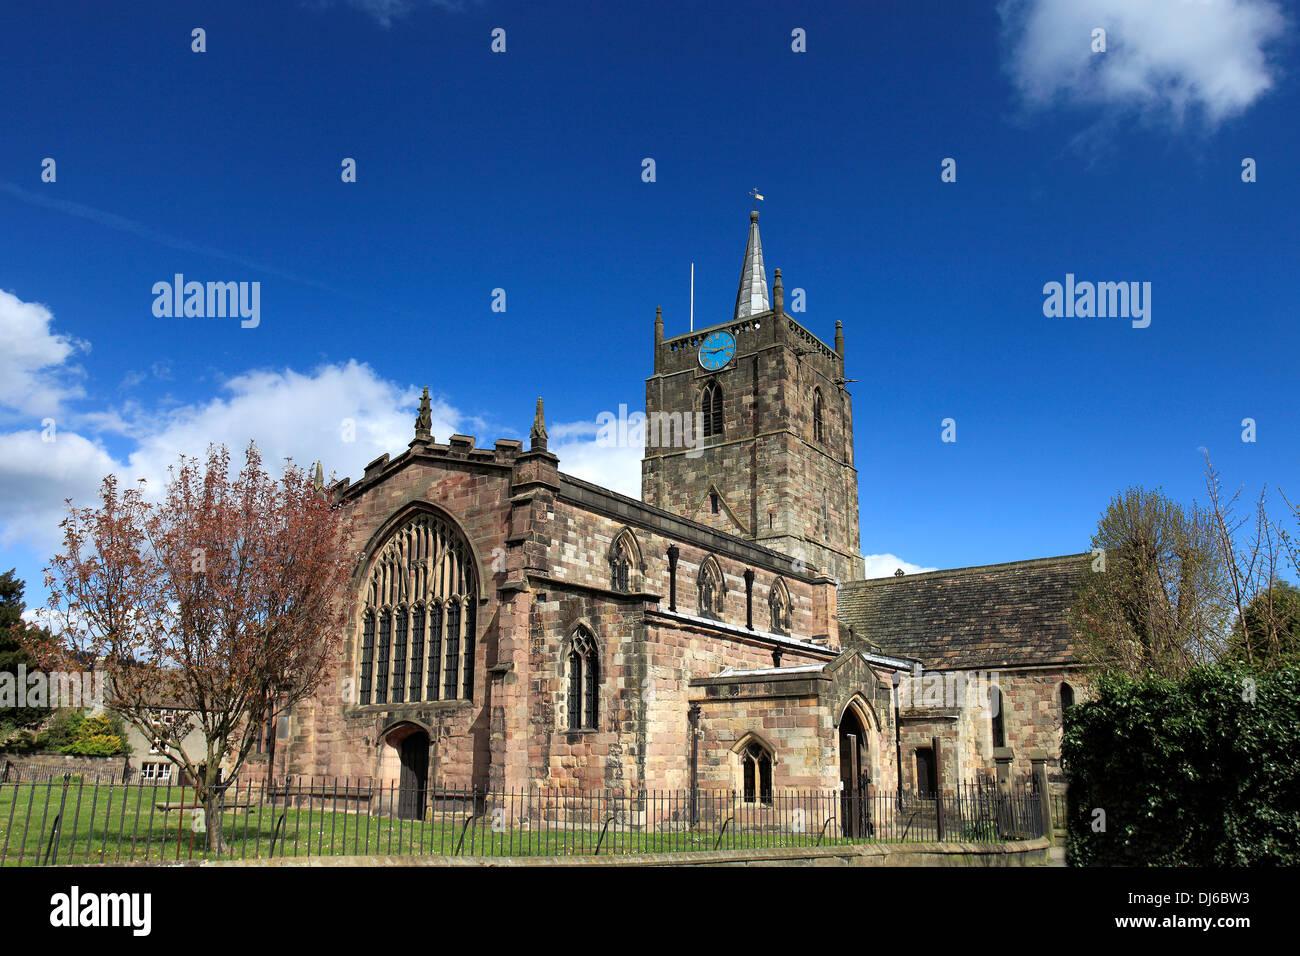 Summer view of St Marys Parish Church, Wirksworth village, Peak District National Park, Derbyshire Dales, England, UK - Stock Image